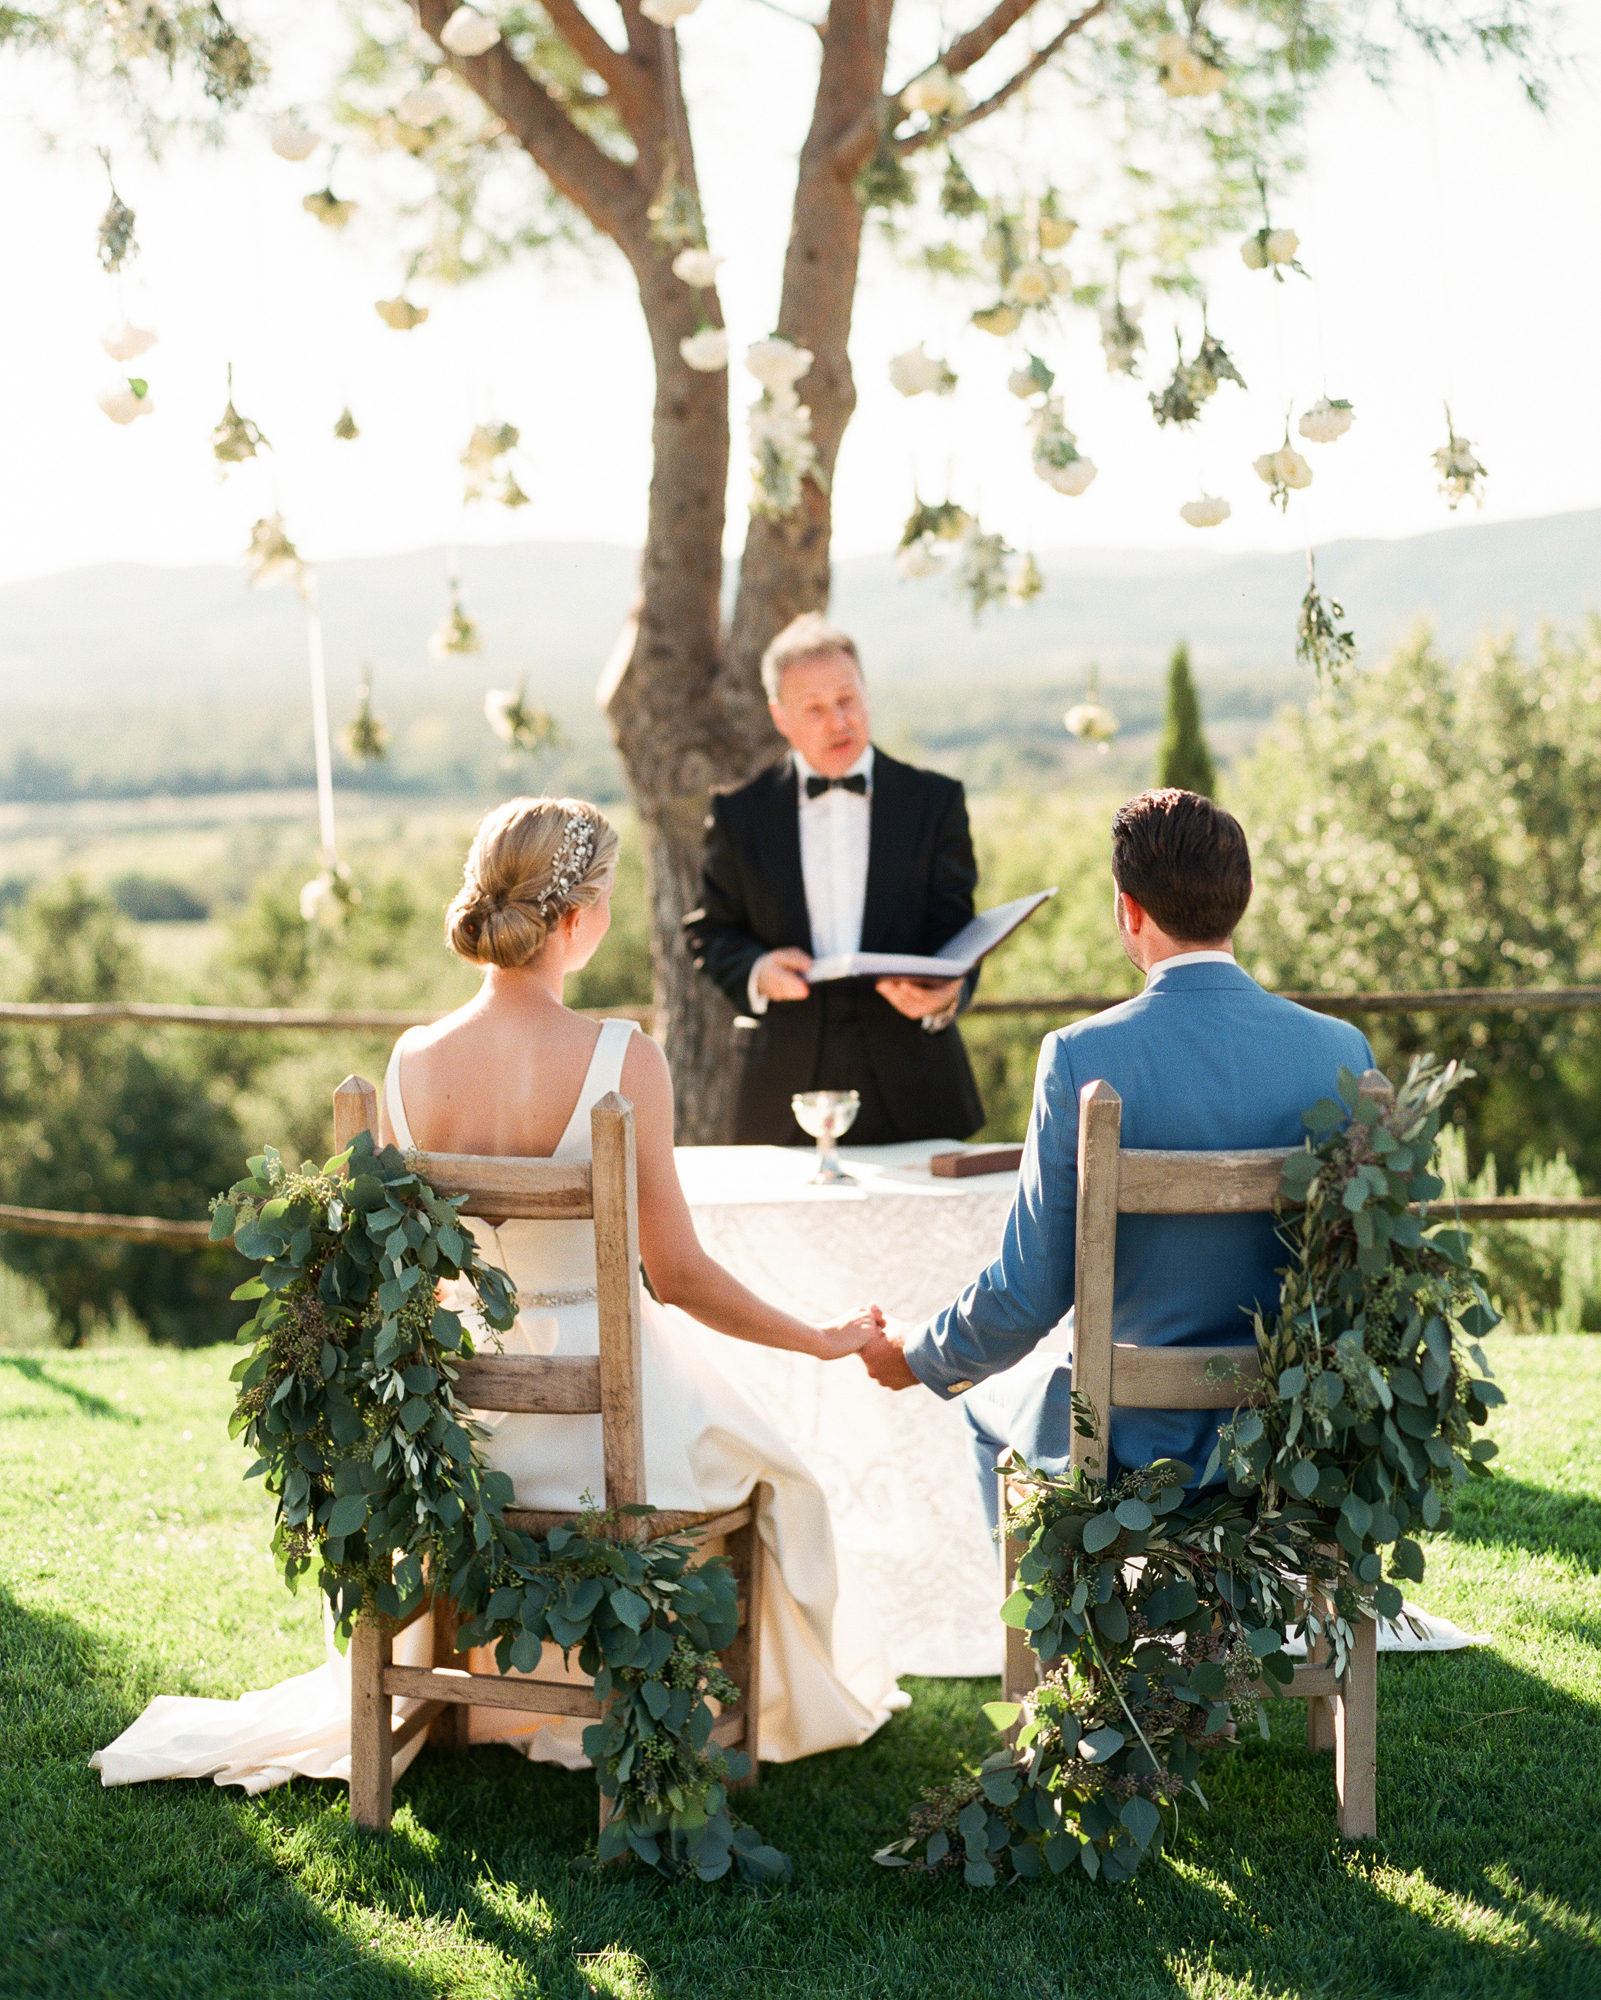 regina-jack-wedding-ceremony-31-s111820-0215.jpg